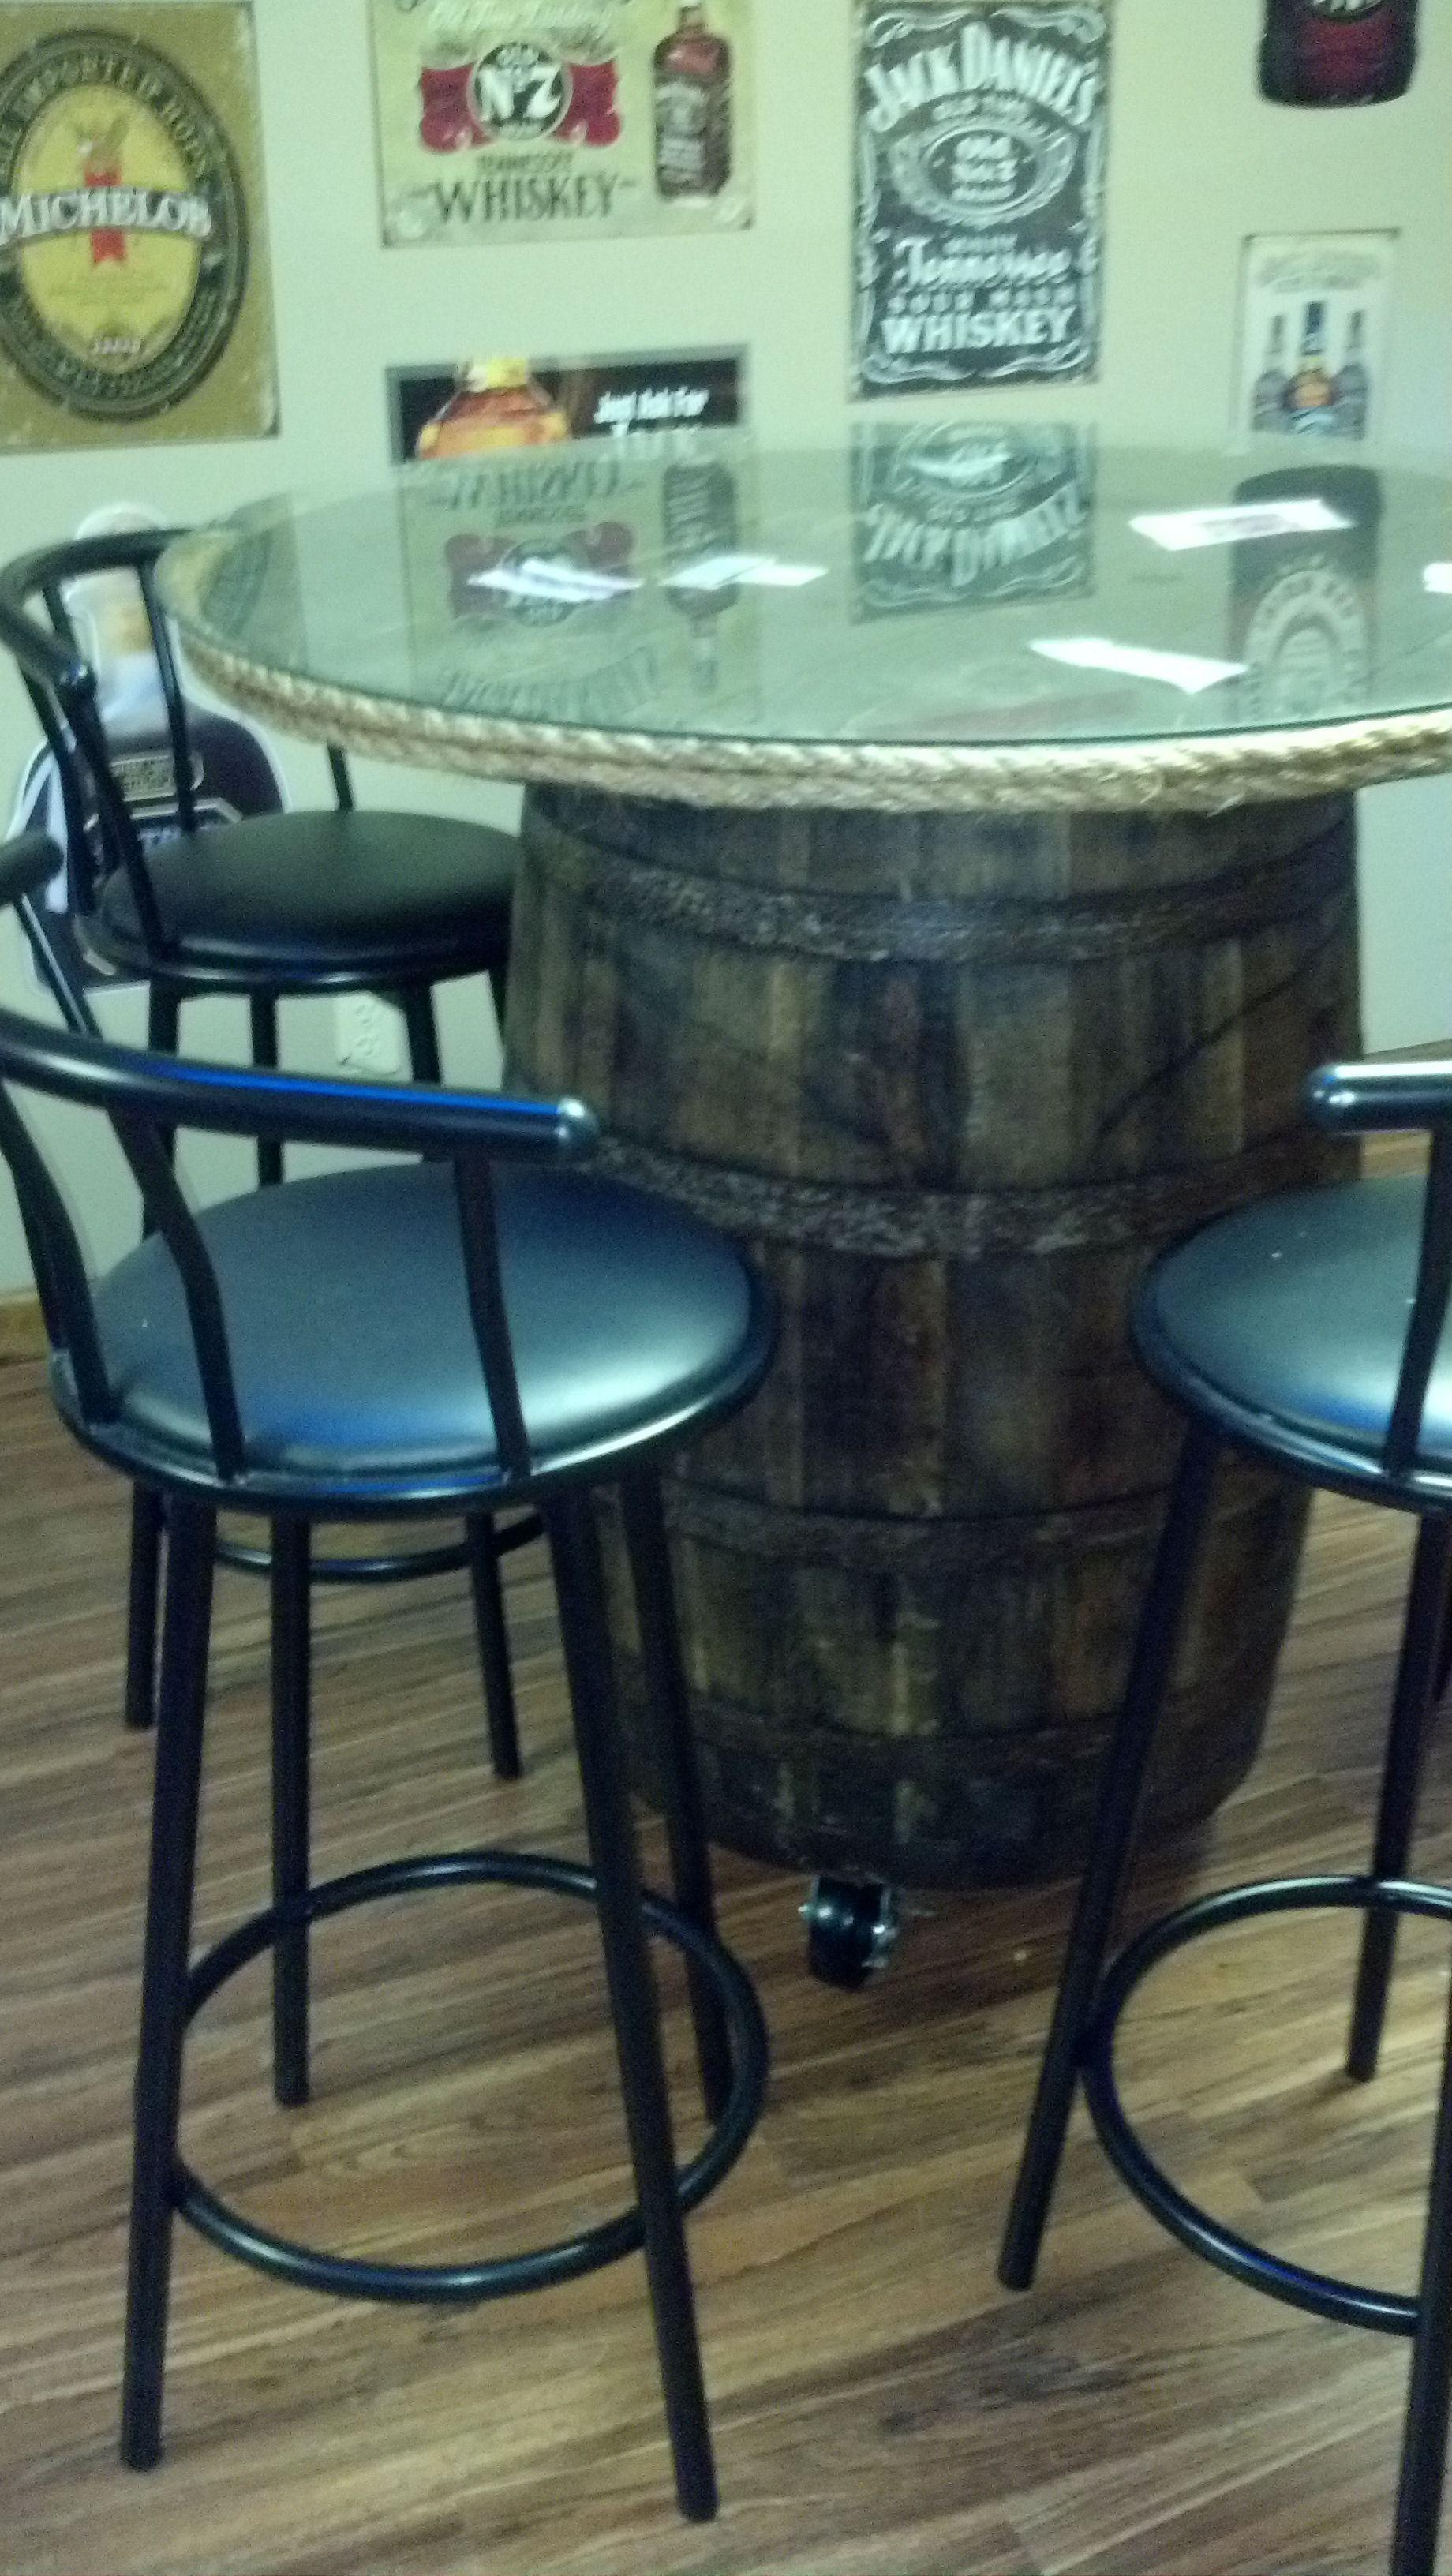 Whiskey Barrel Table Cute Idea For Back Patio Outside